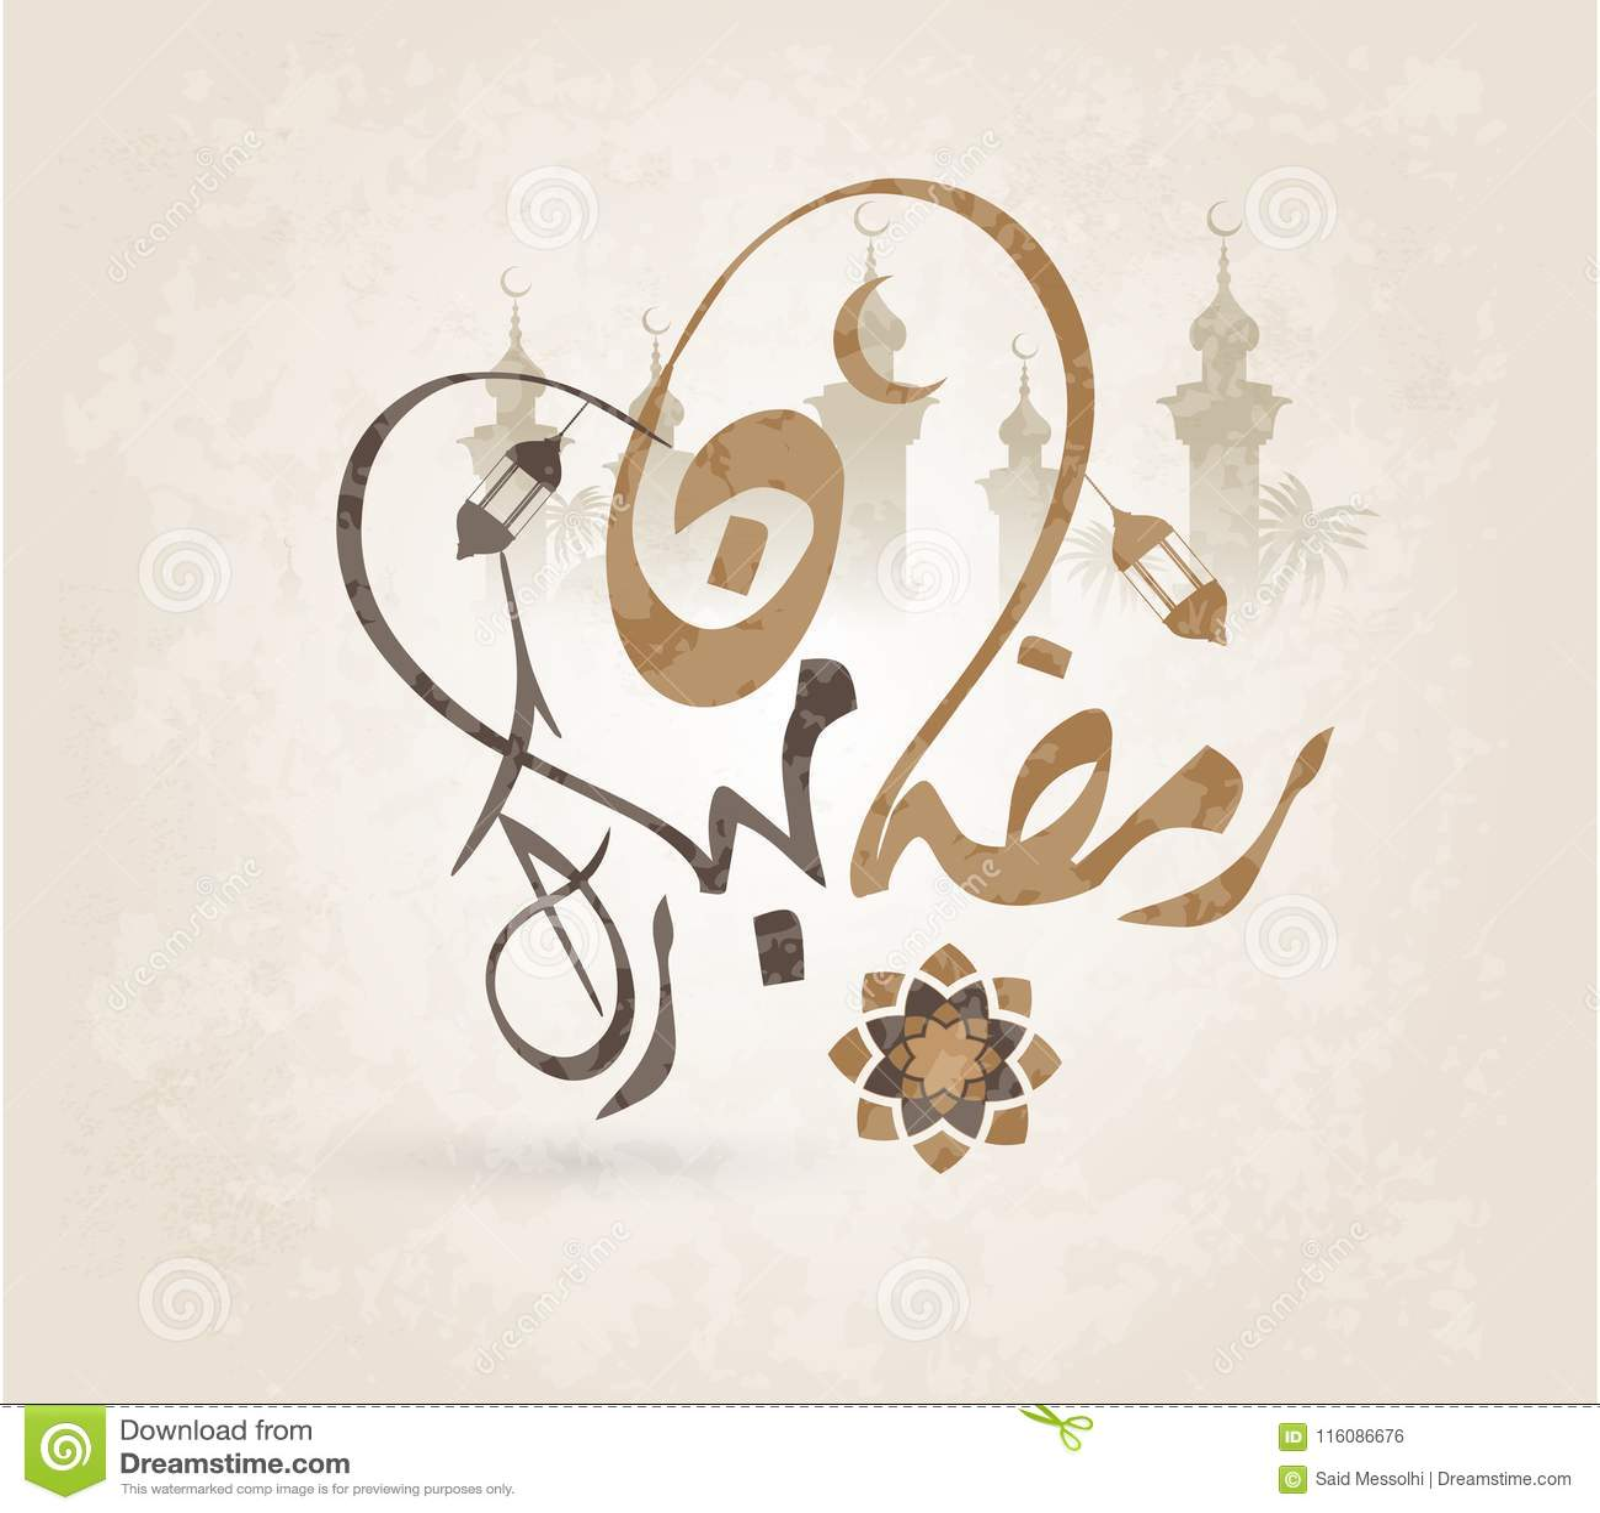 Ramadan kareem beautiful greeting card background with arabic ramadan kareem greeting cards in arabic calligraphy style translation generous ramadhan ramadhan or ramazan is a holy fasting month for muslim moslem m4hsunfo